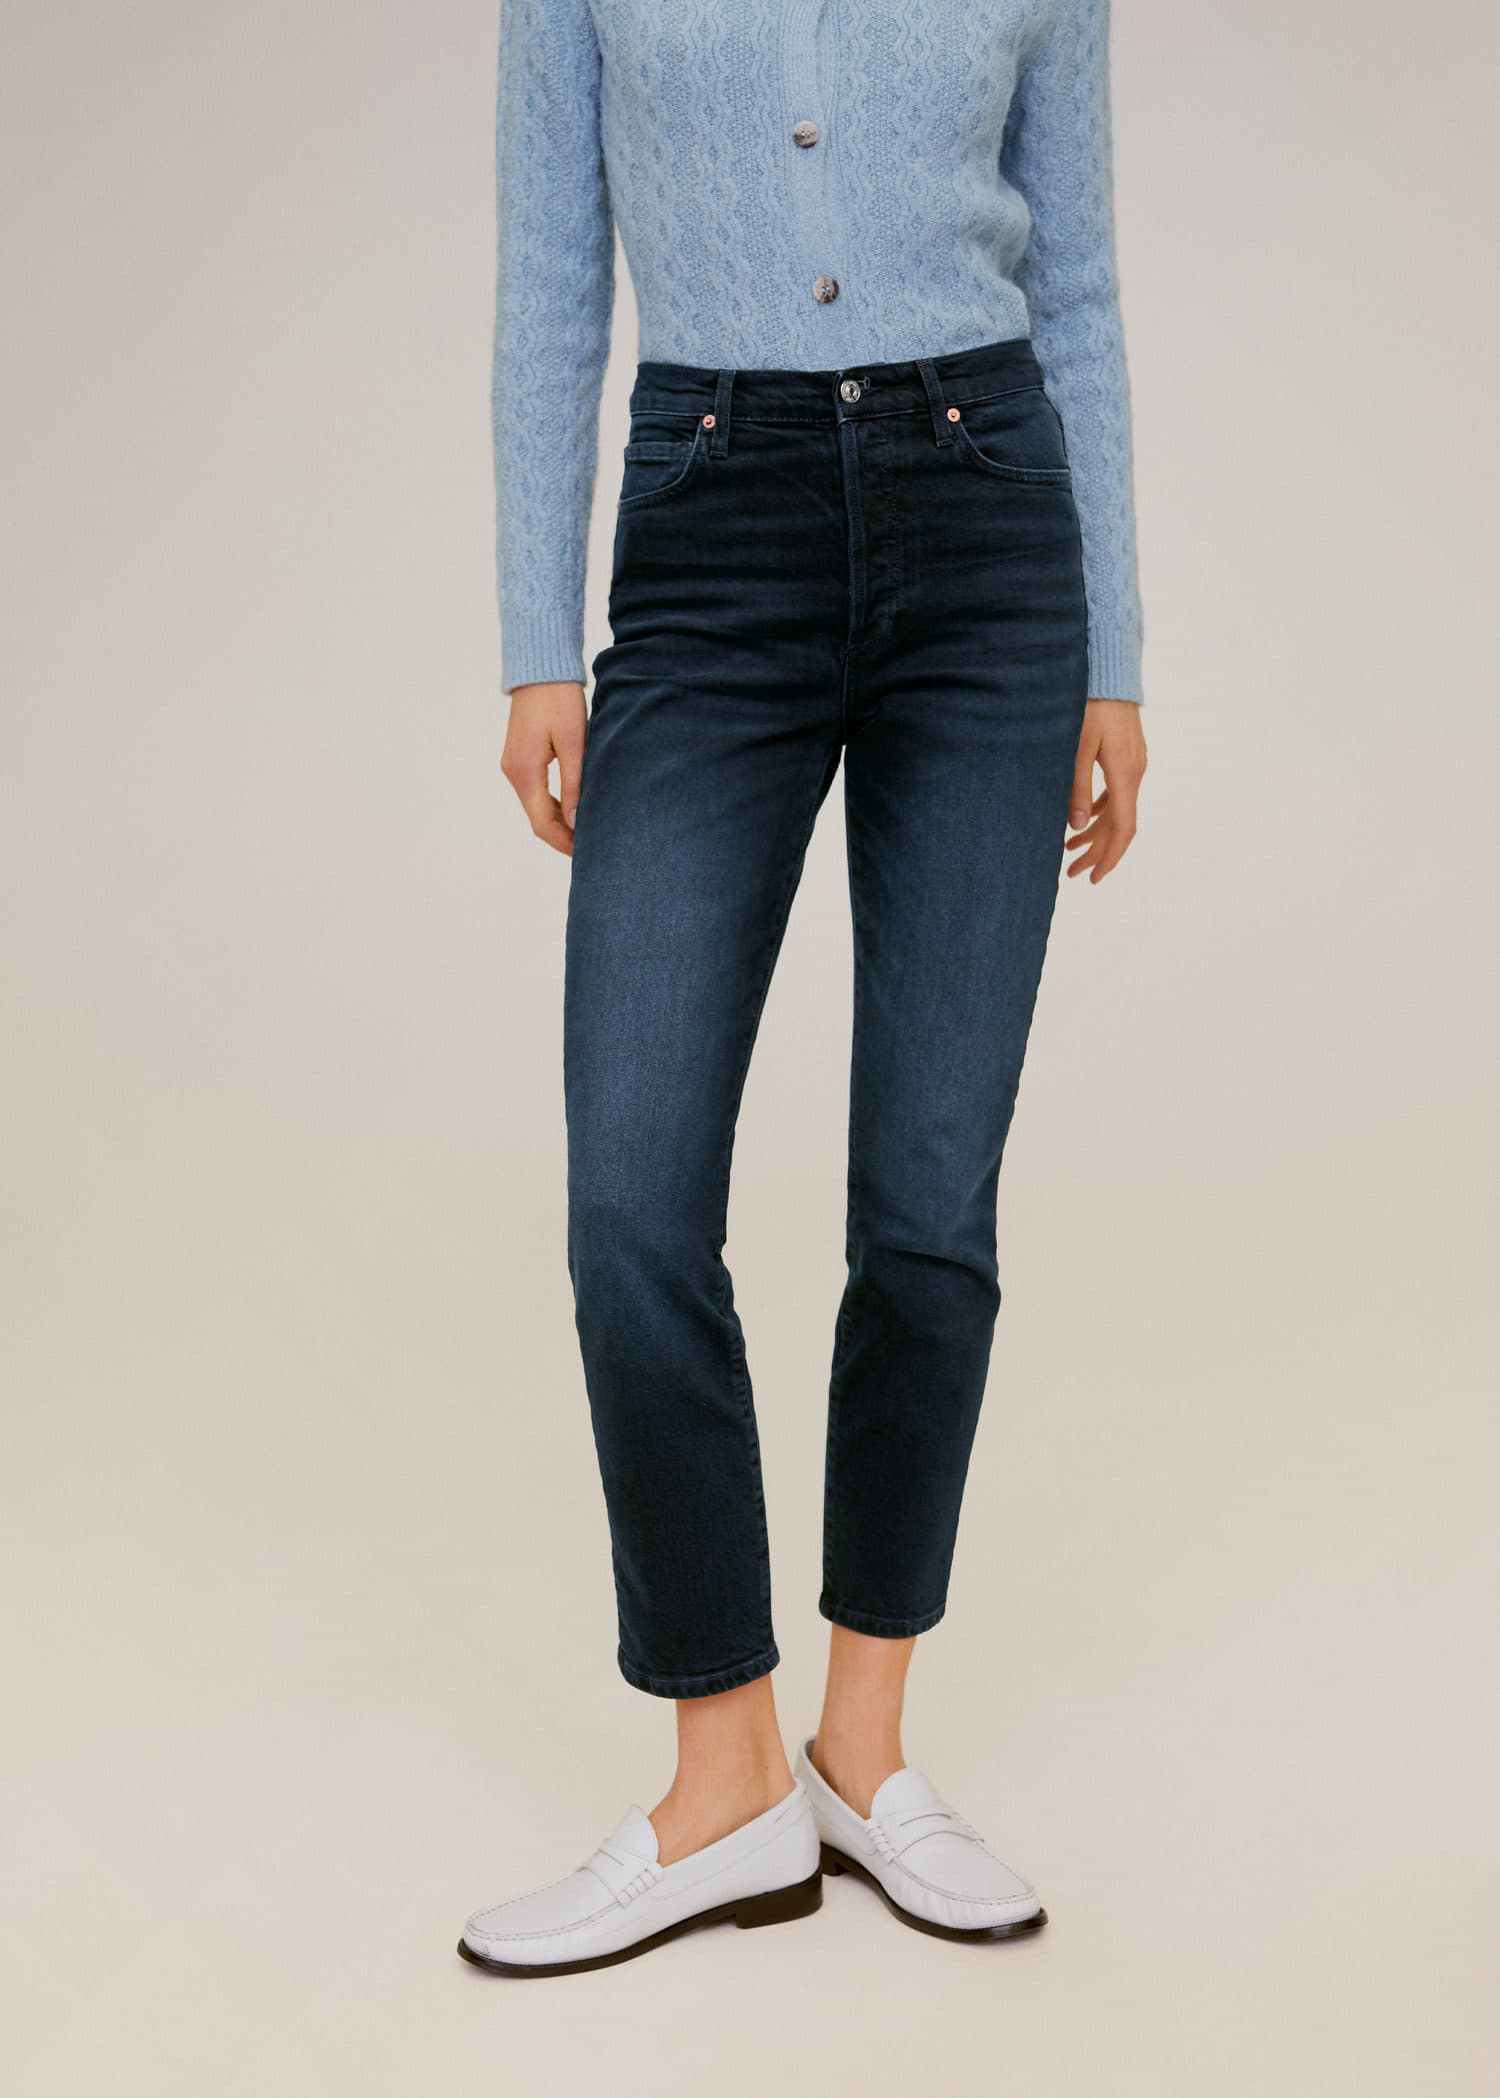 Jean taille haute slim gisele Femme | Mango France